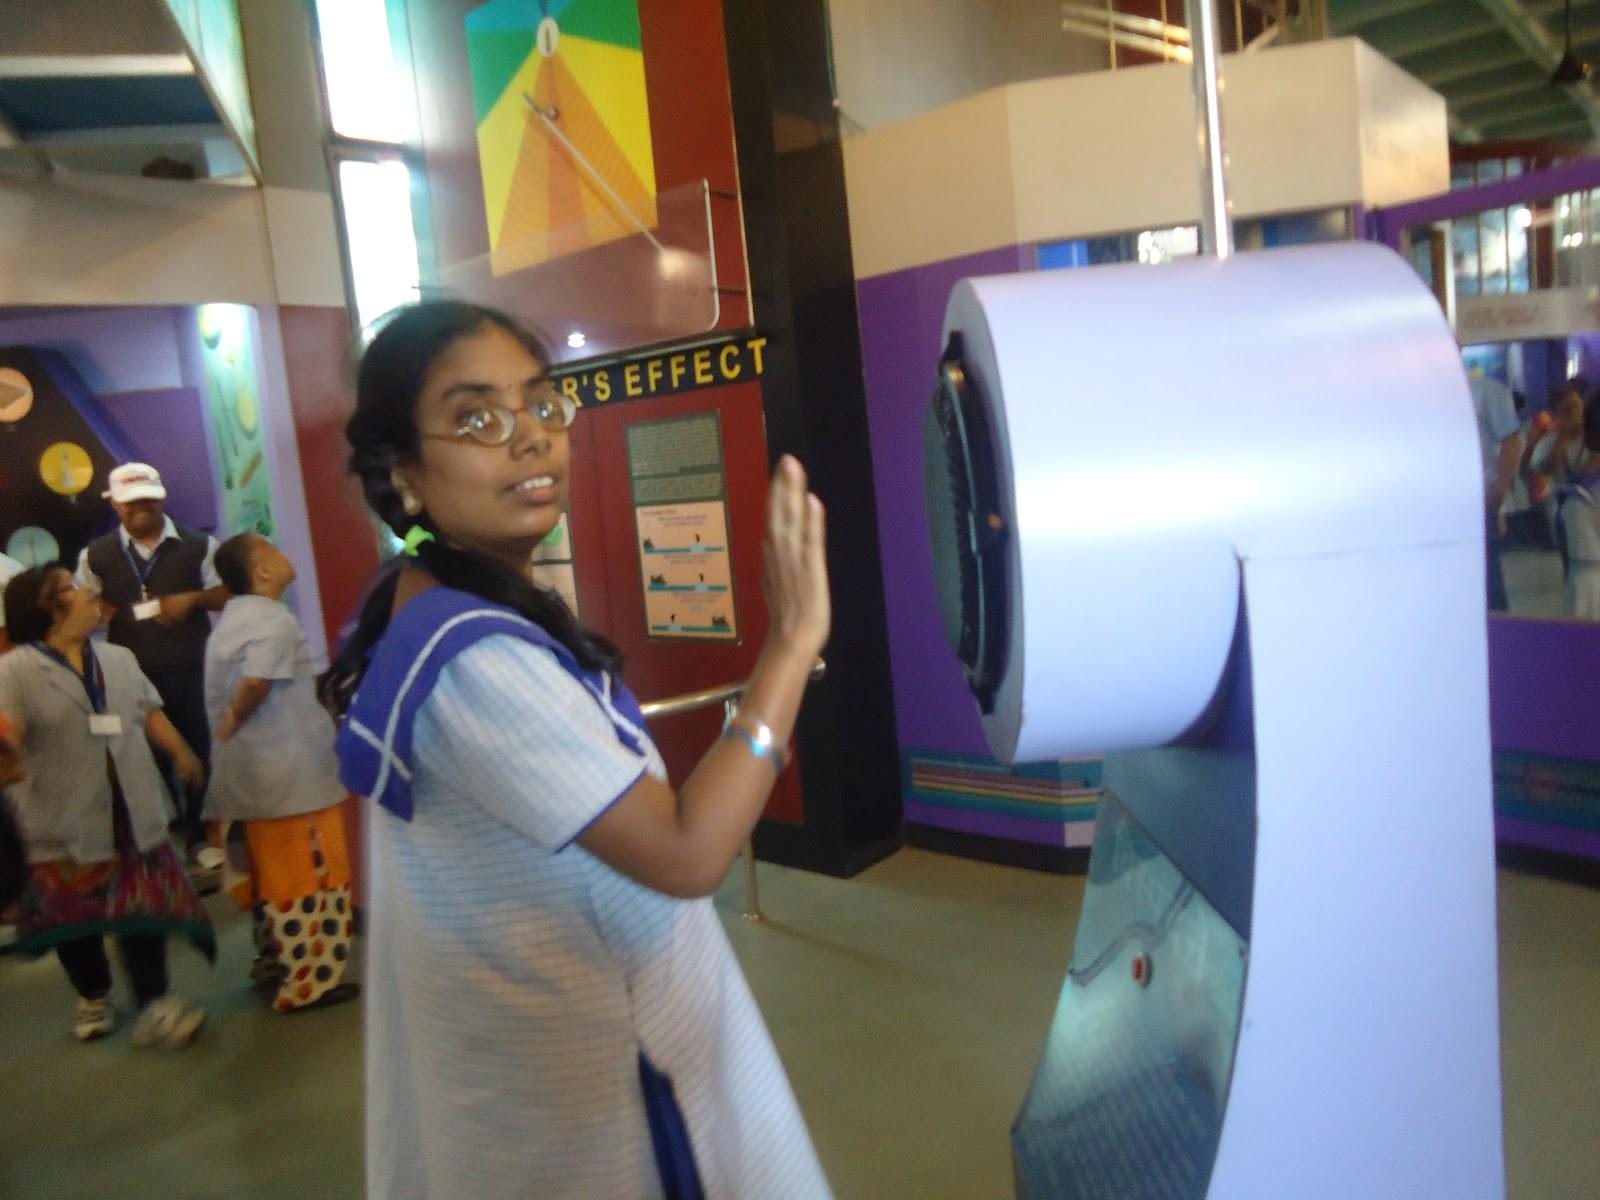 nehru science centre Nehru centre: nehru science centre - see 44 traveler reviews, 45 candid photos, and great deals for mumbai, india, at tripadvisor.